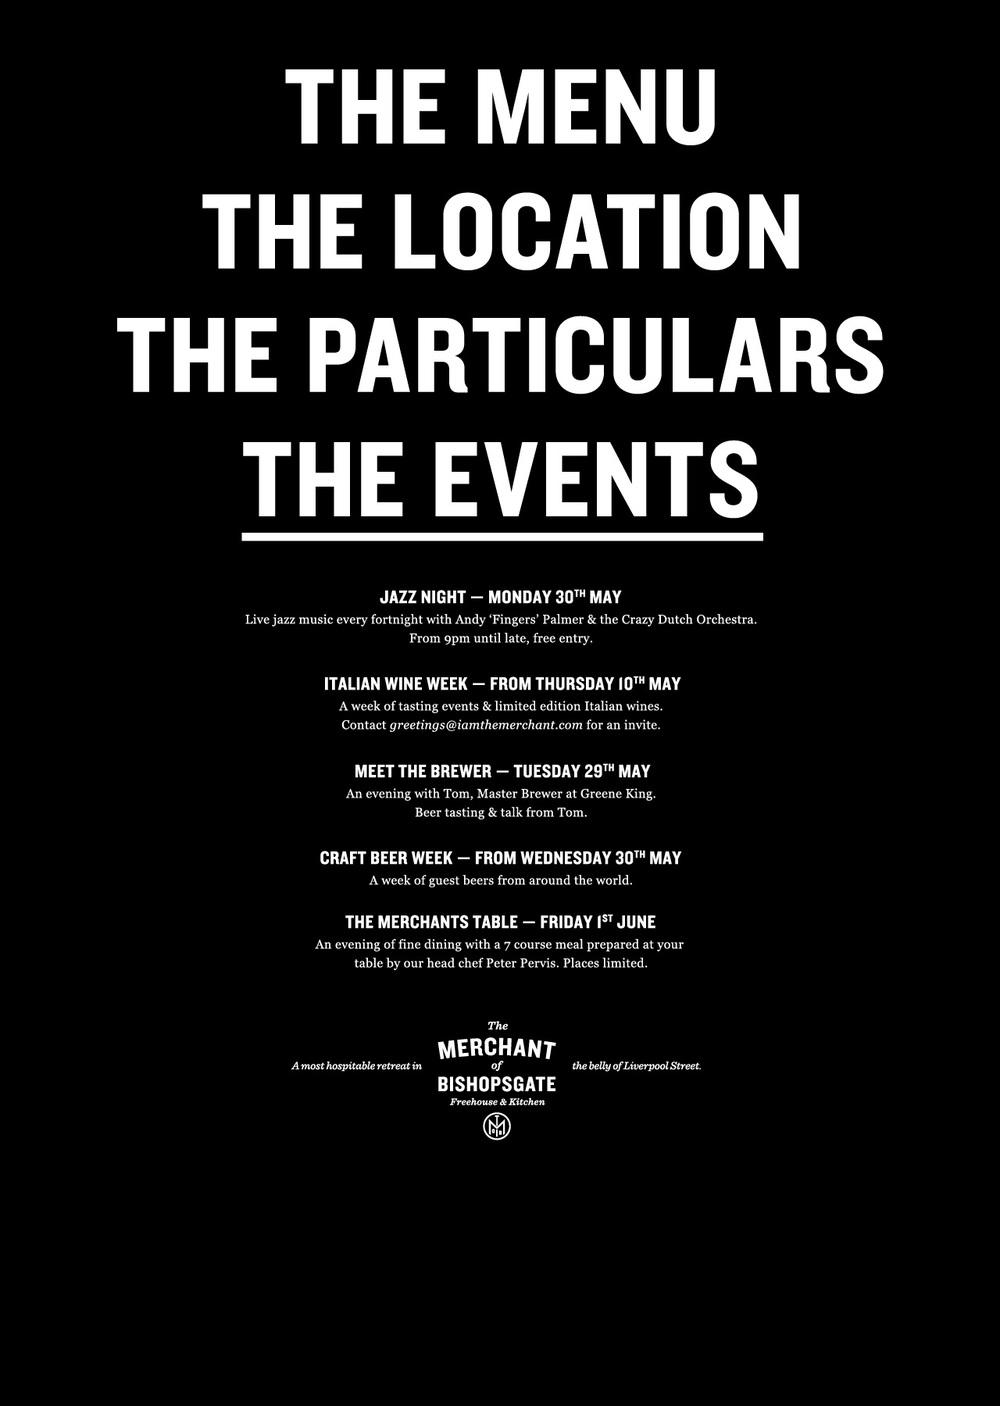 TM_WEB_0004_THE EVENTS.jpg